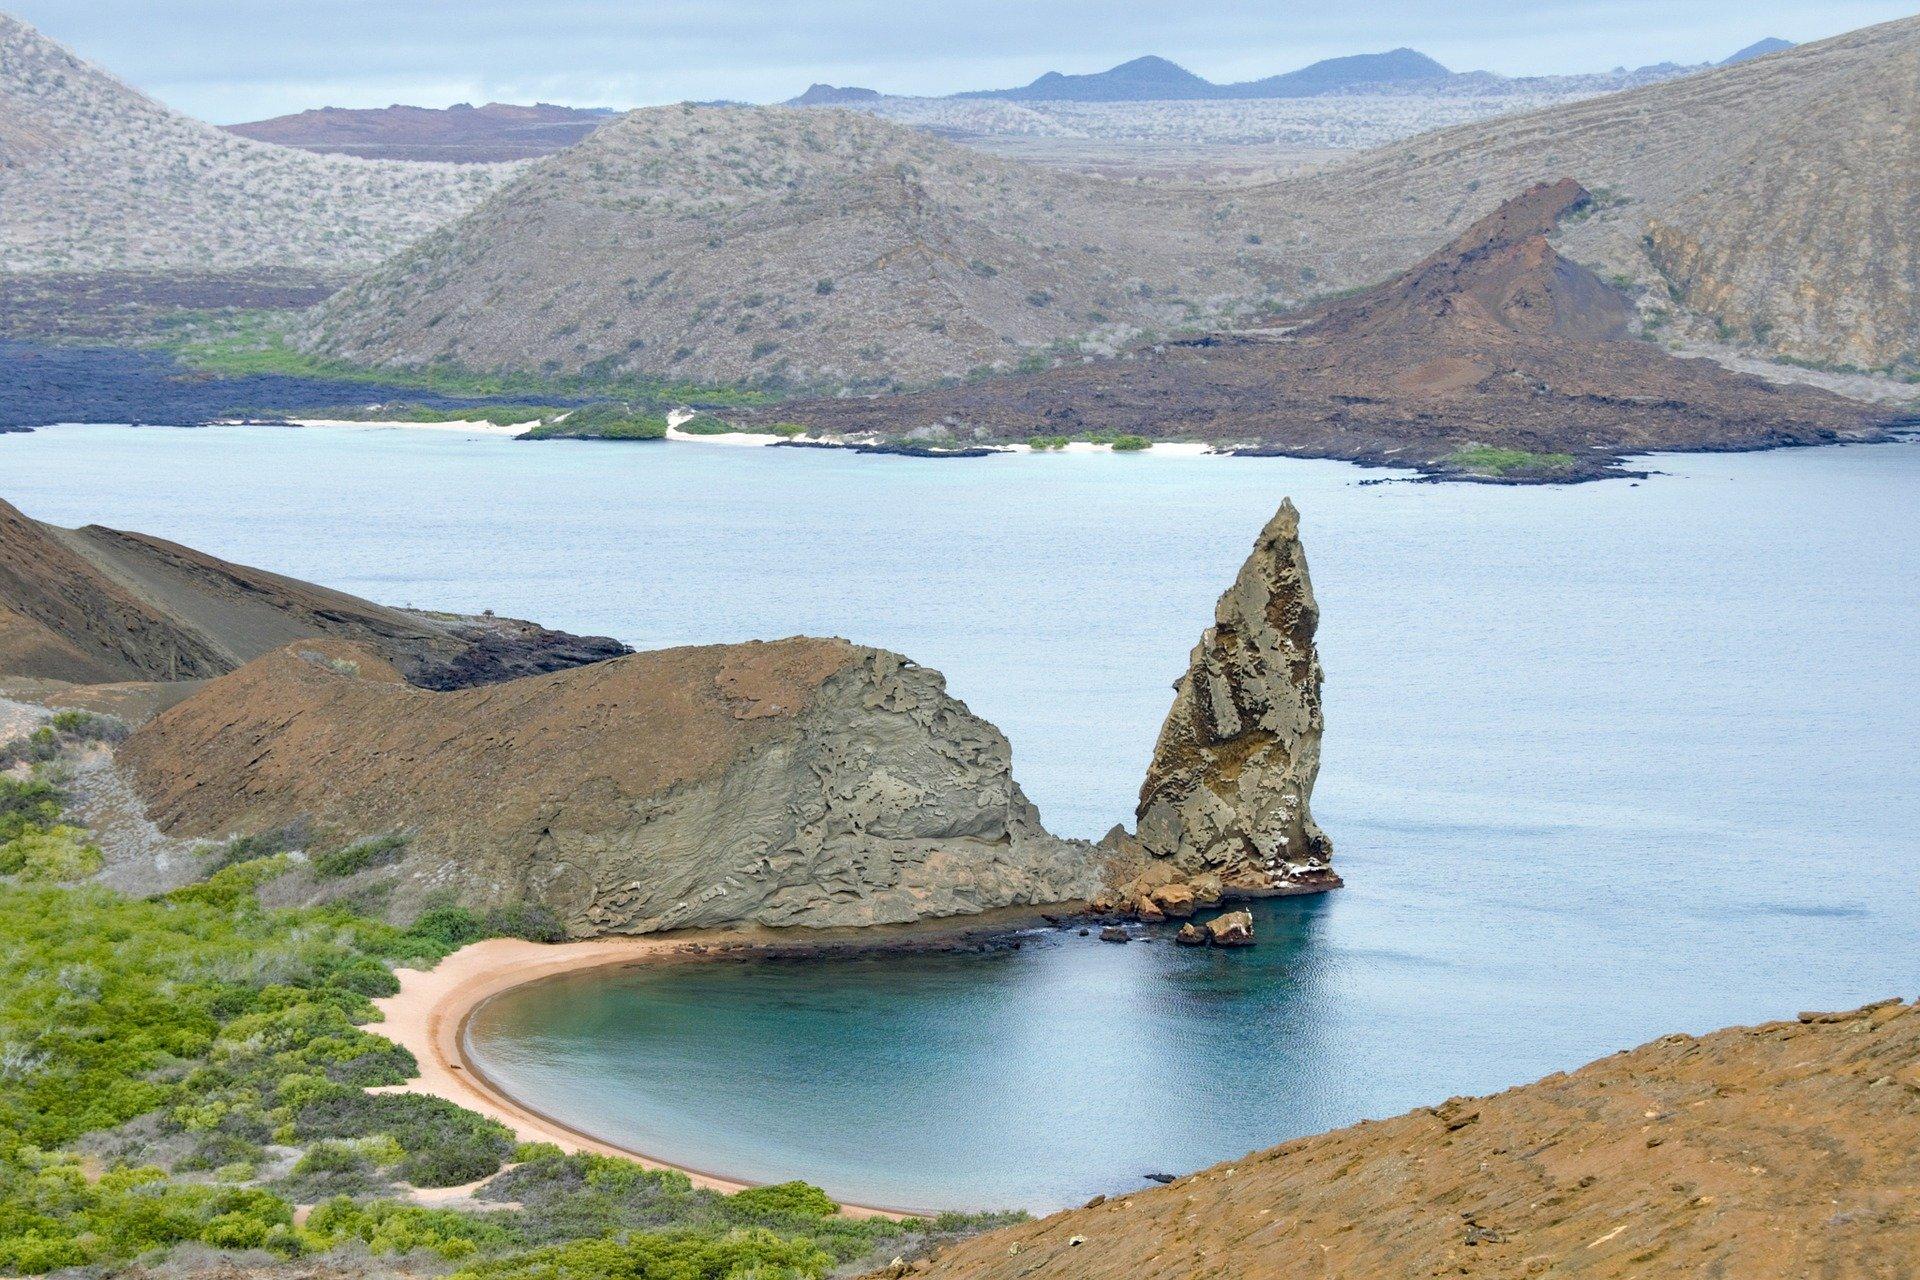 Putovanje Ekvador - Ekvador s Galapagosom (13)